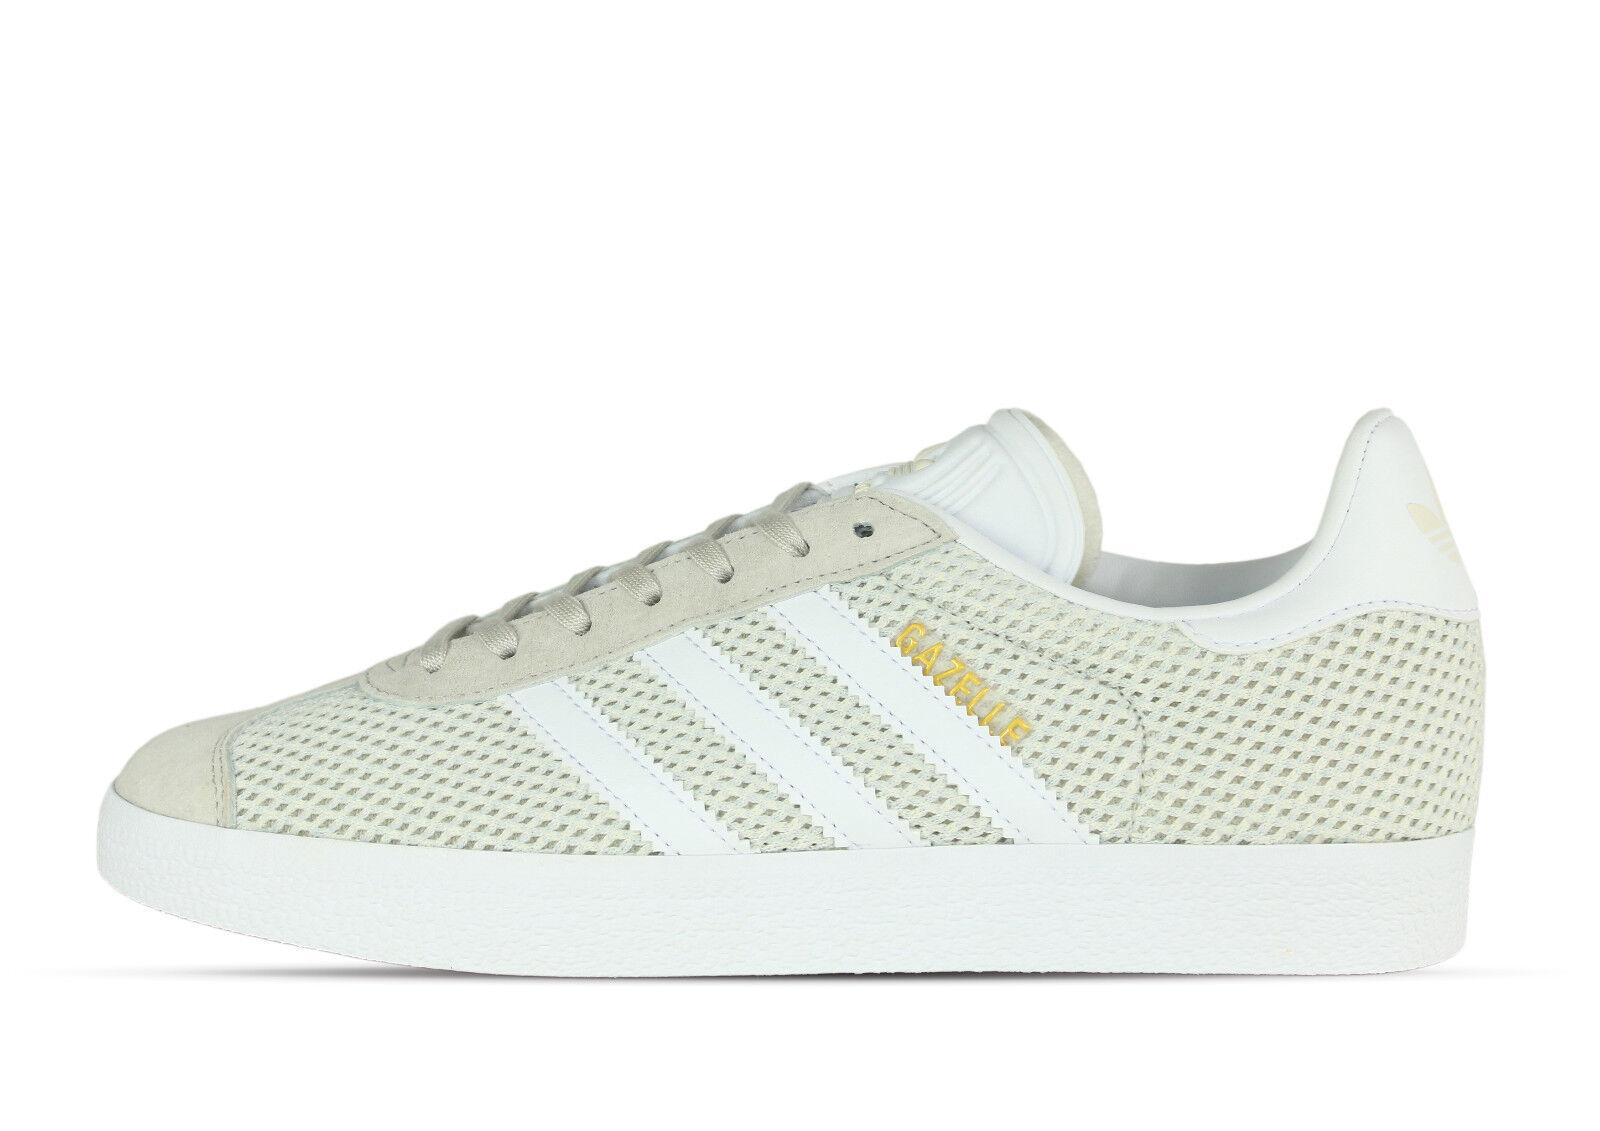 Adidas Gazelle Women Talc BB5178 - light grey - Trainers - Ladies + new +